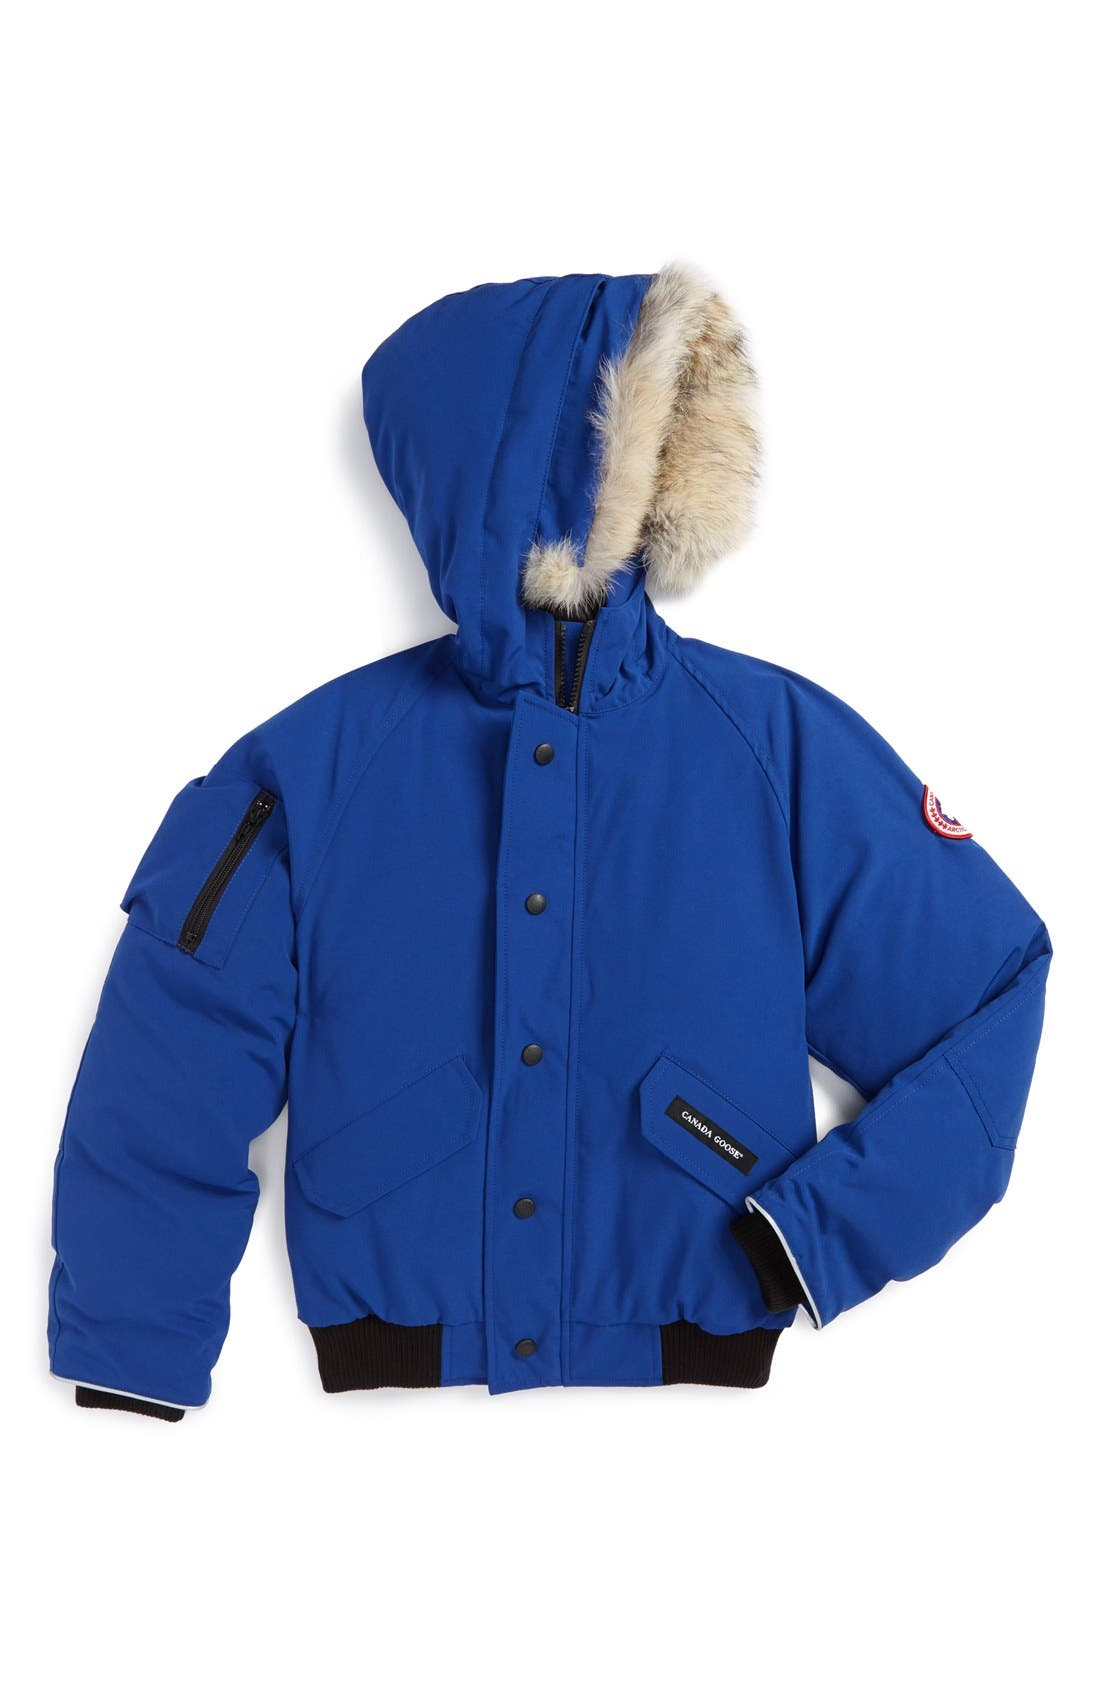 Canada Goose 'Rundle' Down Bomber Jacket with Genuine Coyote Fur Trim (Little Kid & Big Kid)